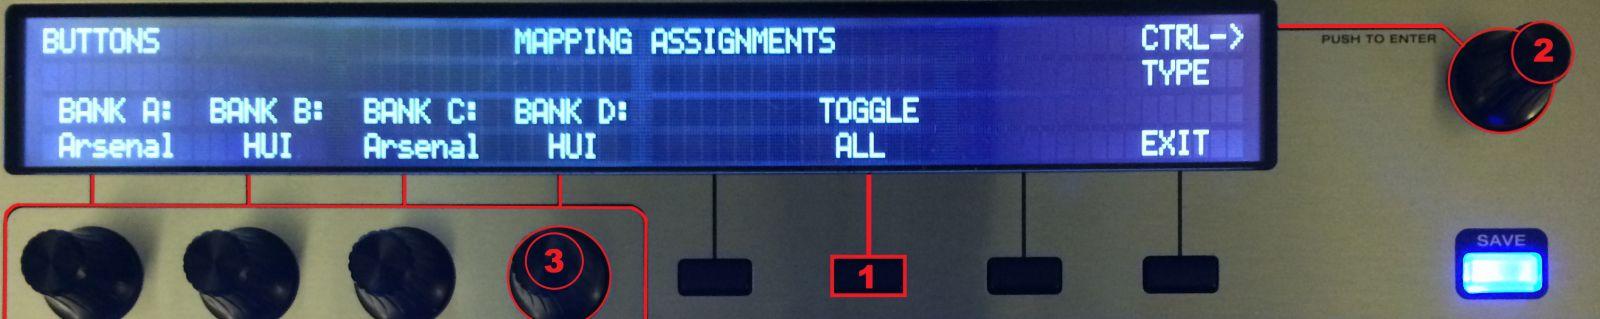 TFP Pro Tools Arsenal 04